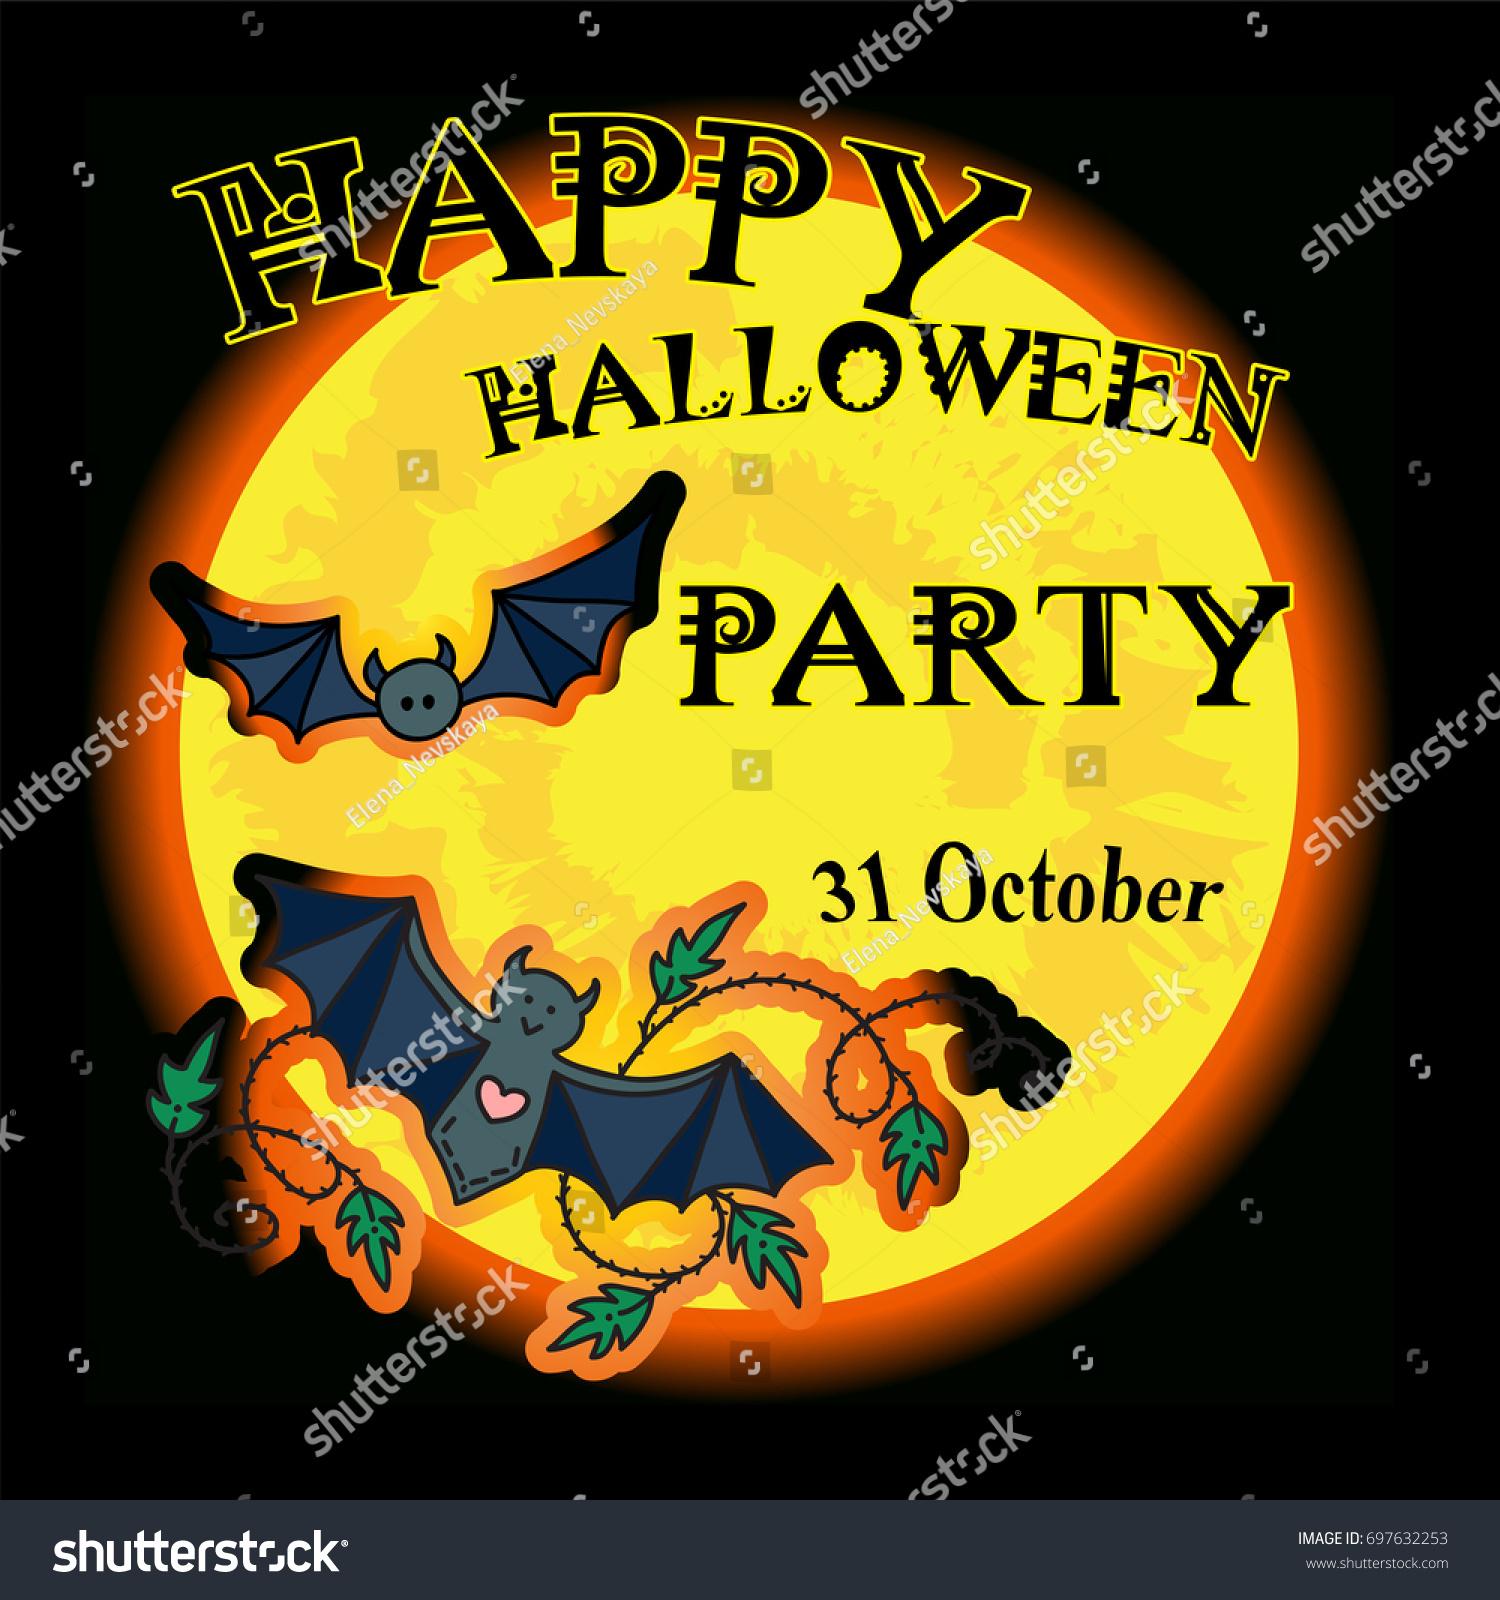 Vector Happy Halloween Party Invitation Card Stock Vector 697632253 ...